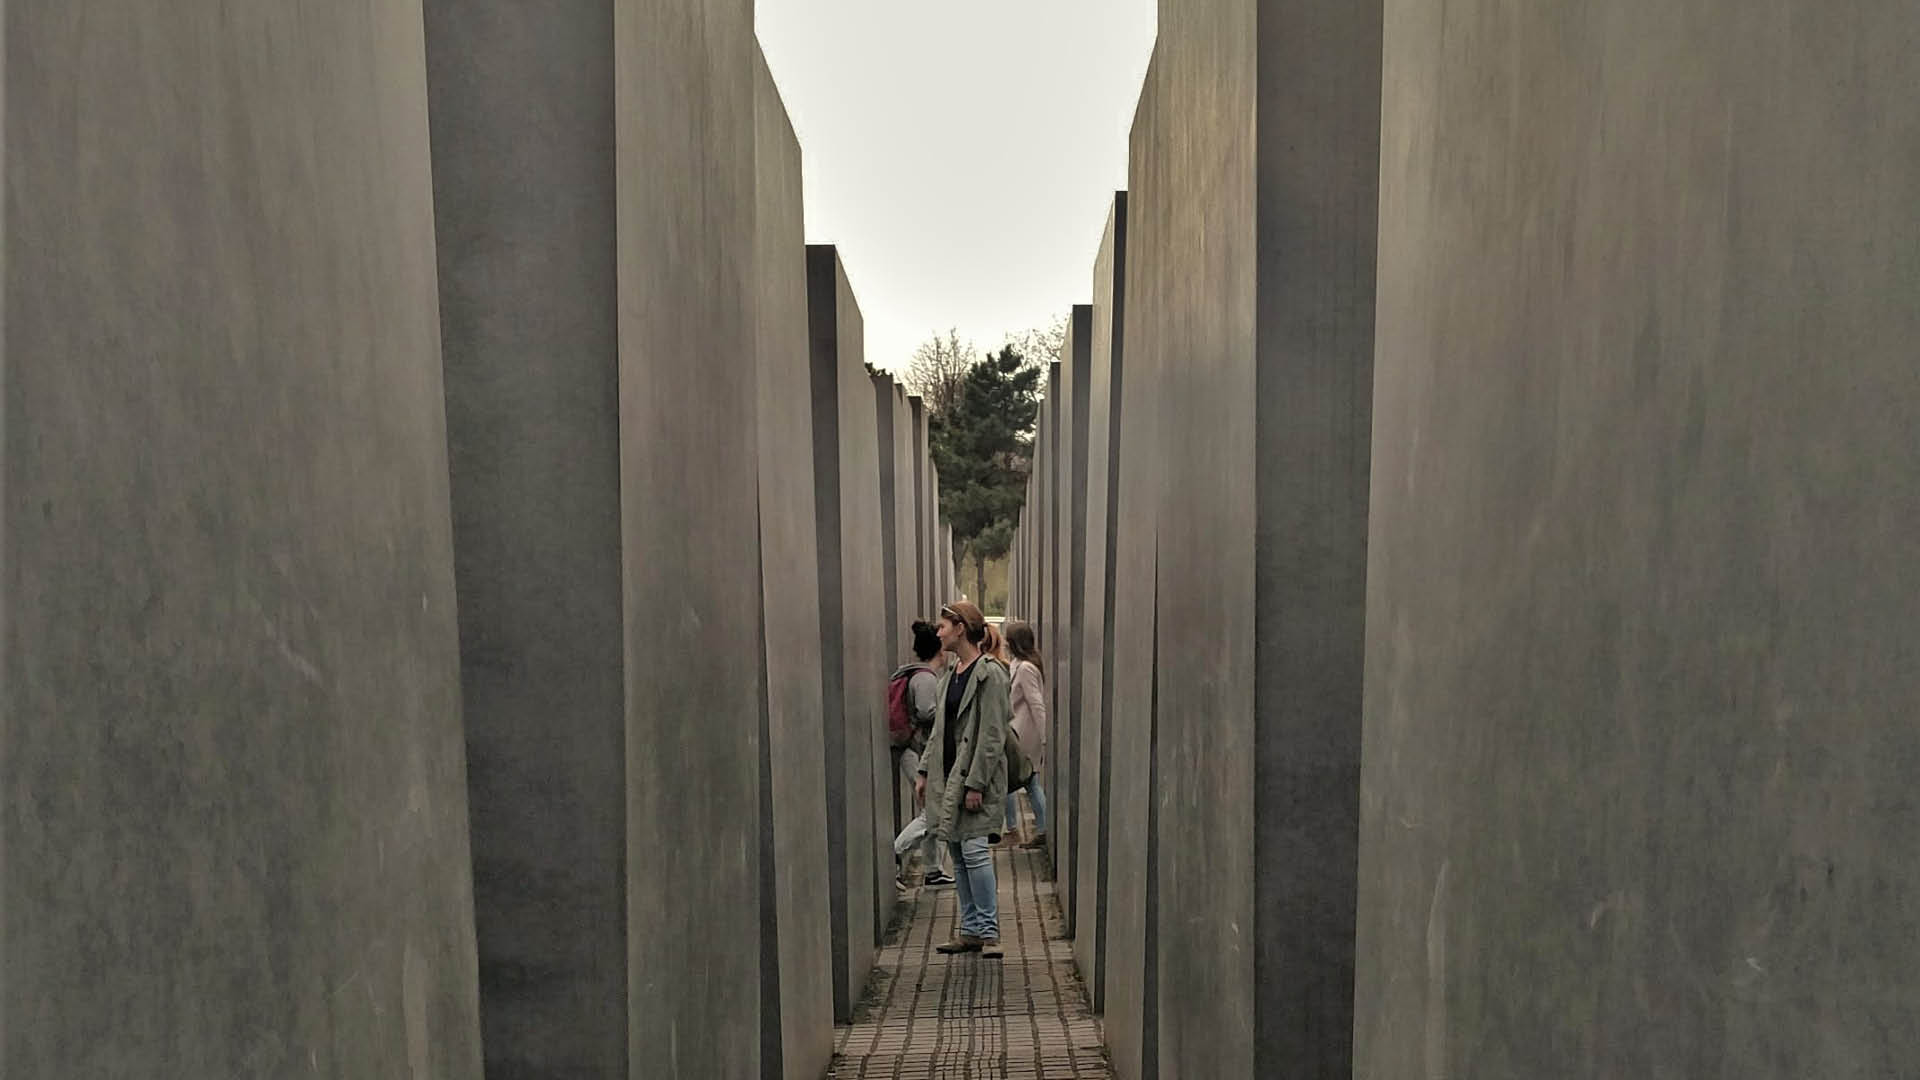 13 18 6 Exkursion Berlin